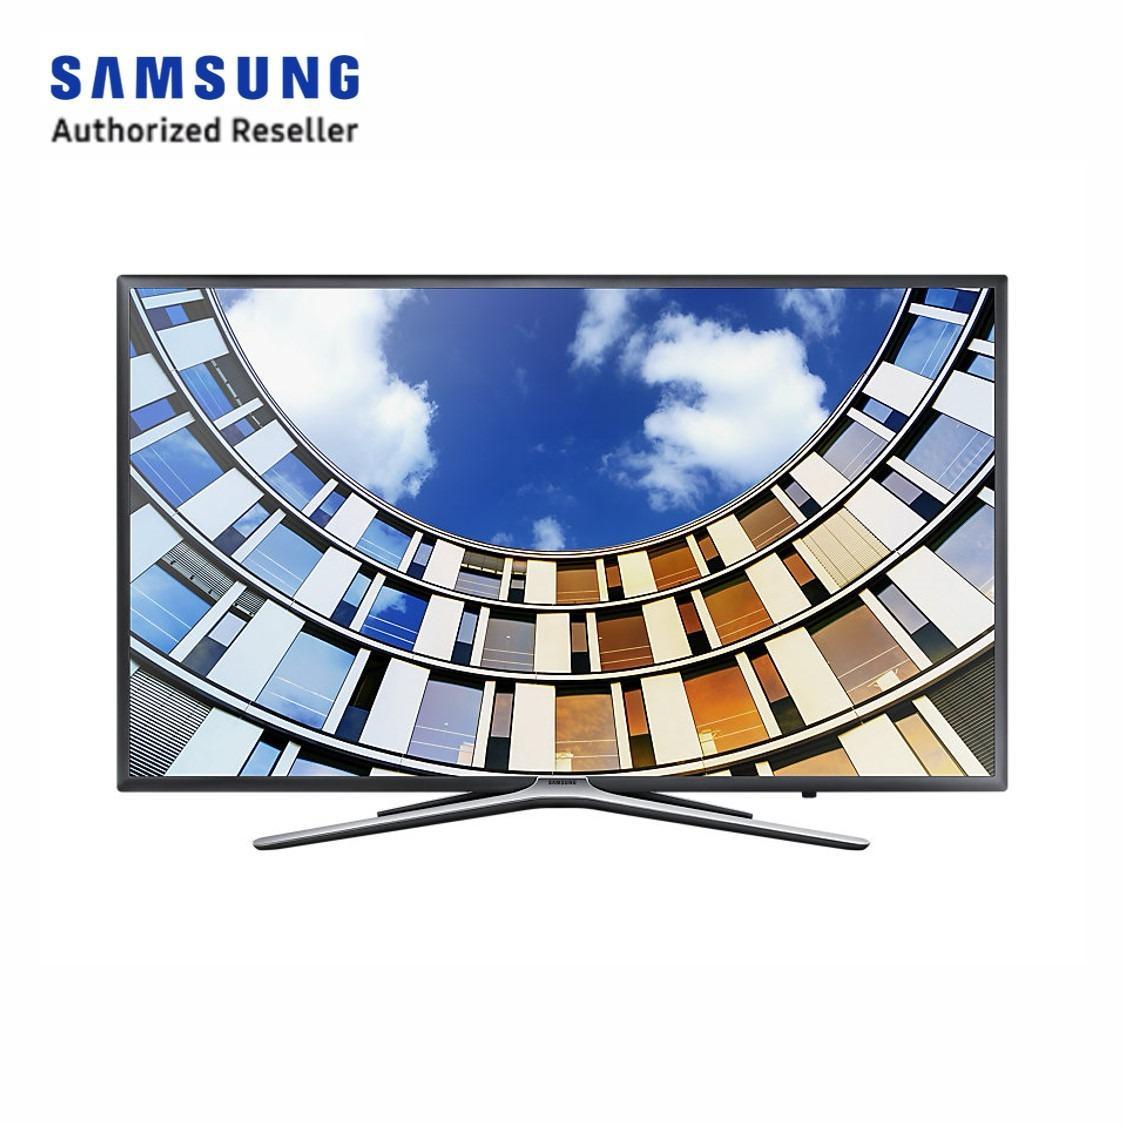 Samsung 55 Fhd Smart Tv M5500 Series 5 Ua55M5500Akxxs In Stock